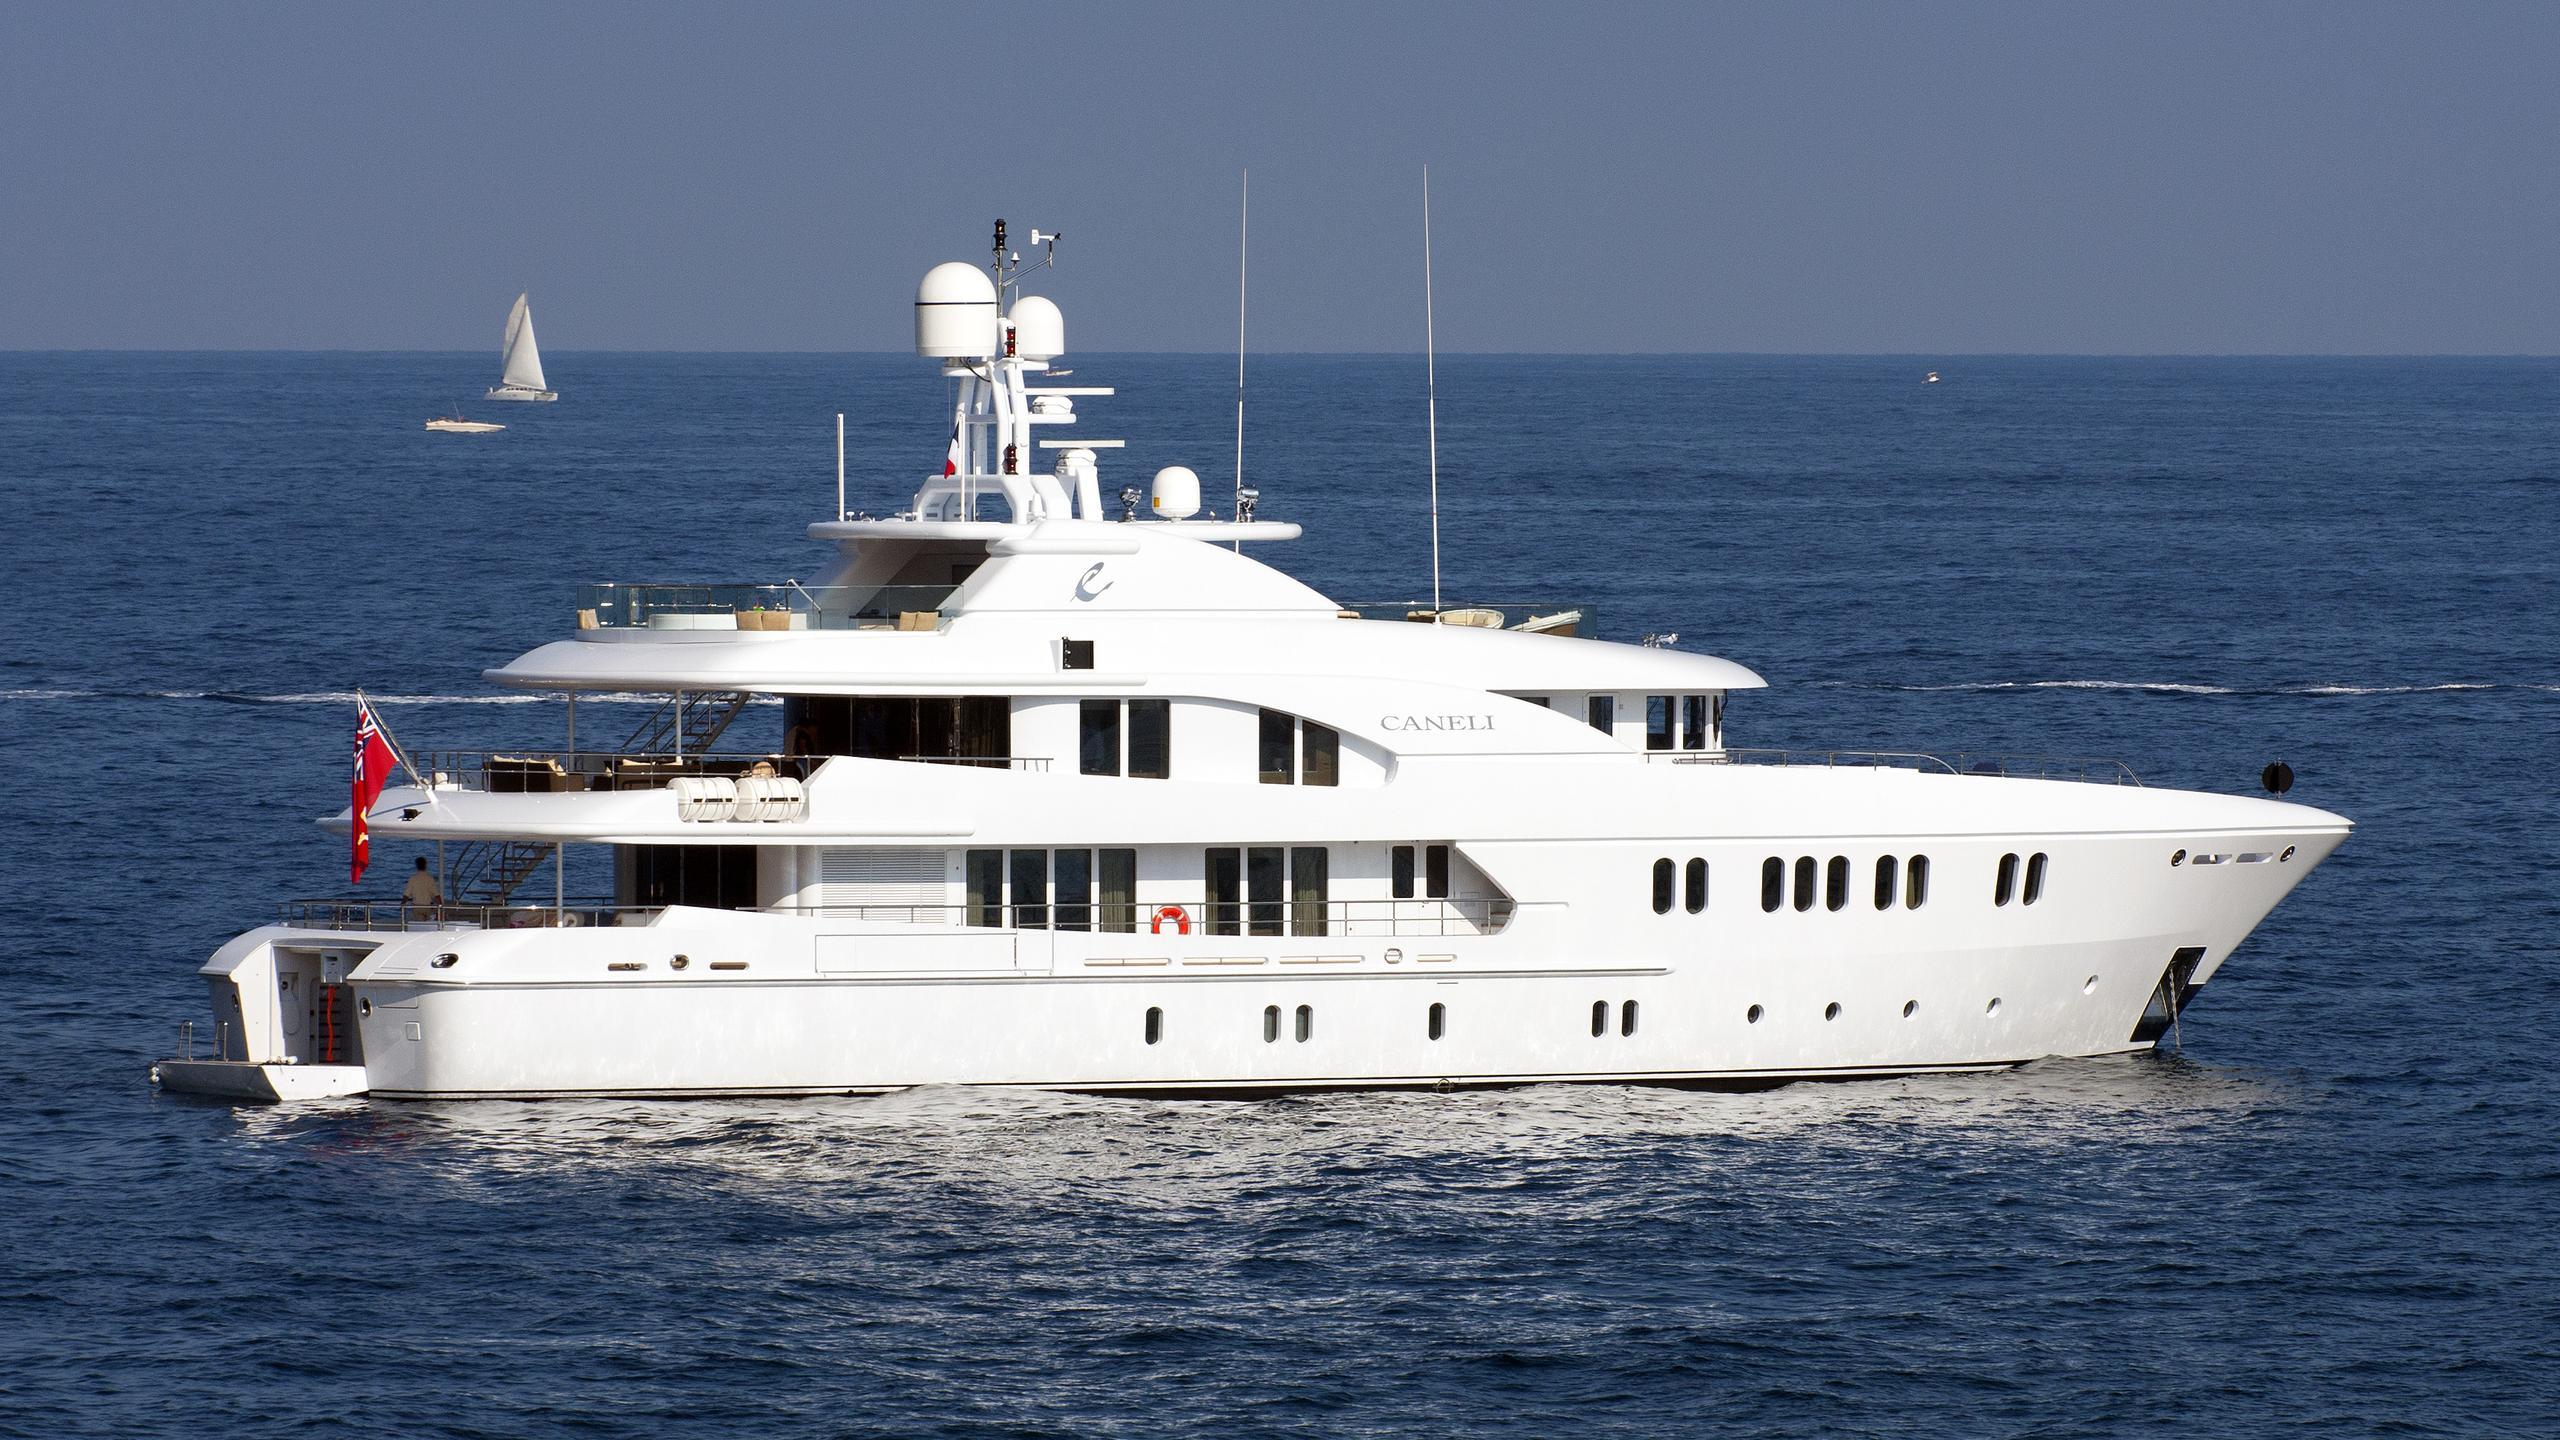 triple-8-motor-yacht-royal-denship-aarhus-143-2008-43m-profile